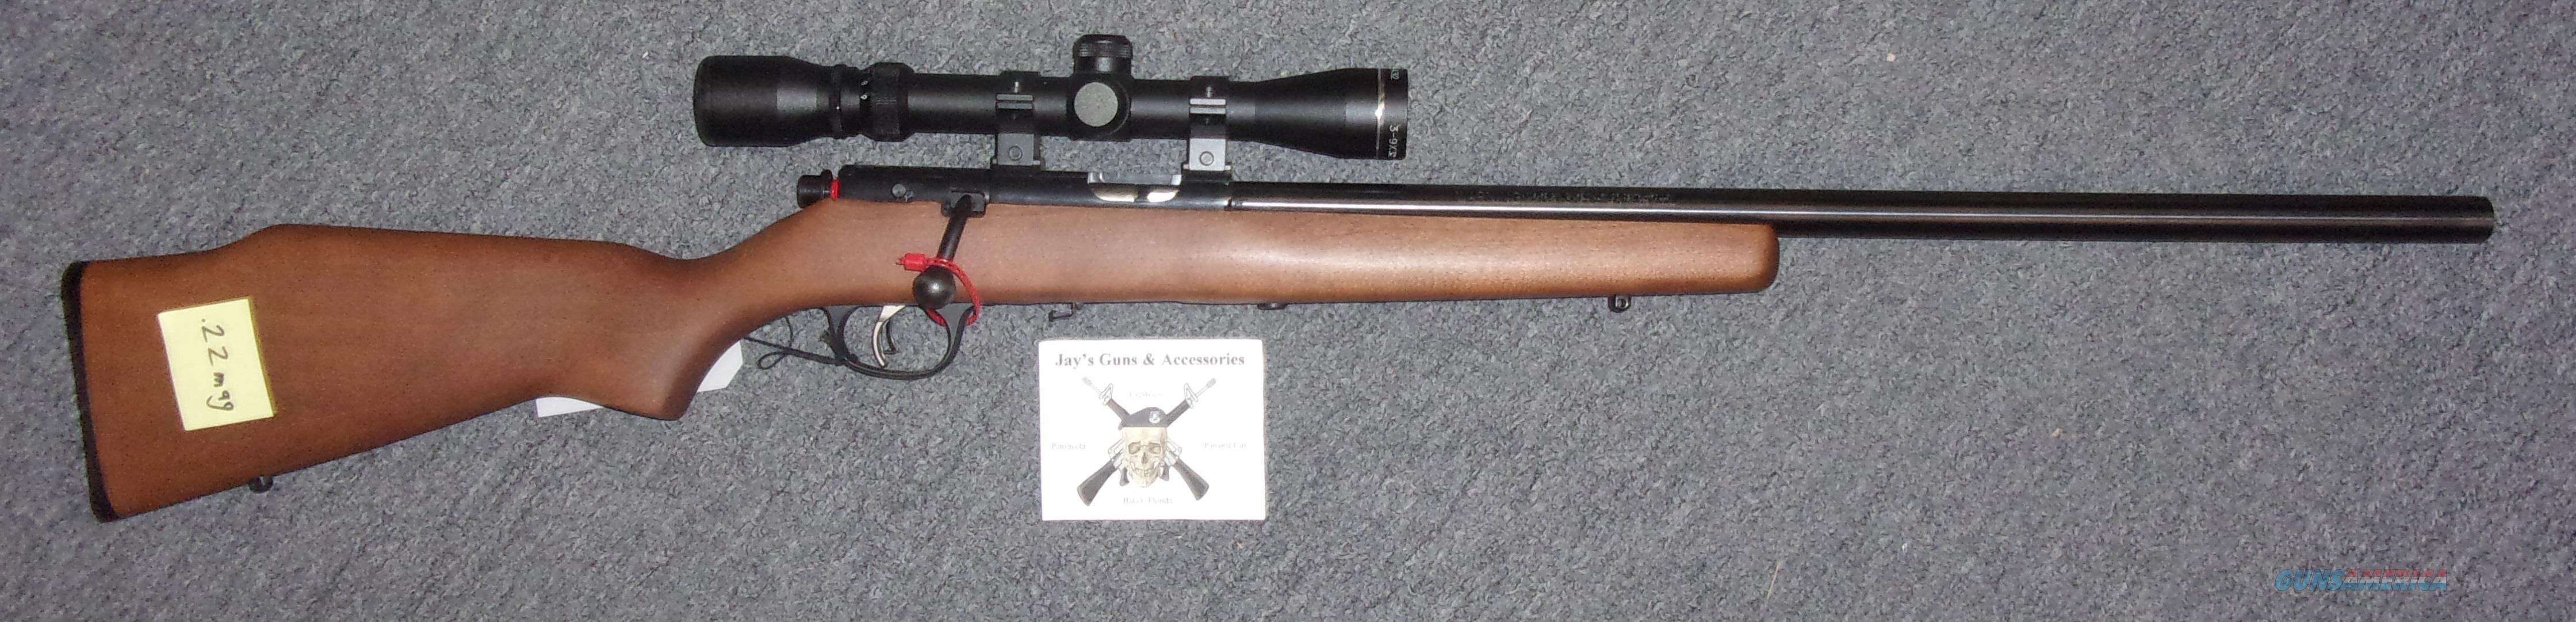 Marlin XT22MVO  Guns > Rifles > Marlin Rifles > Modern > Bolt/Pump